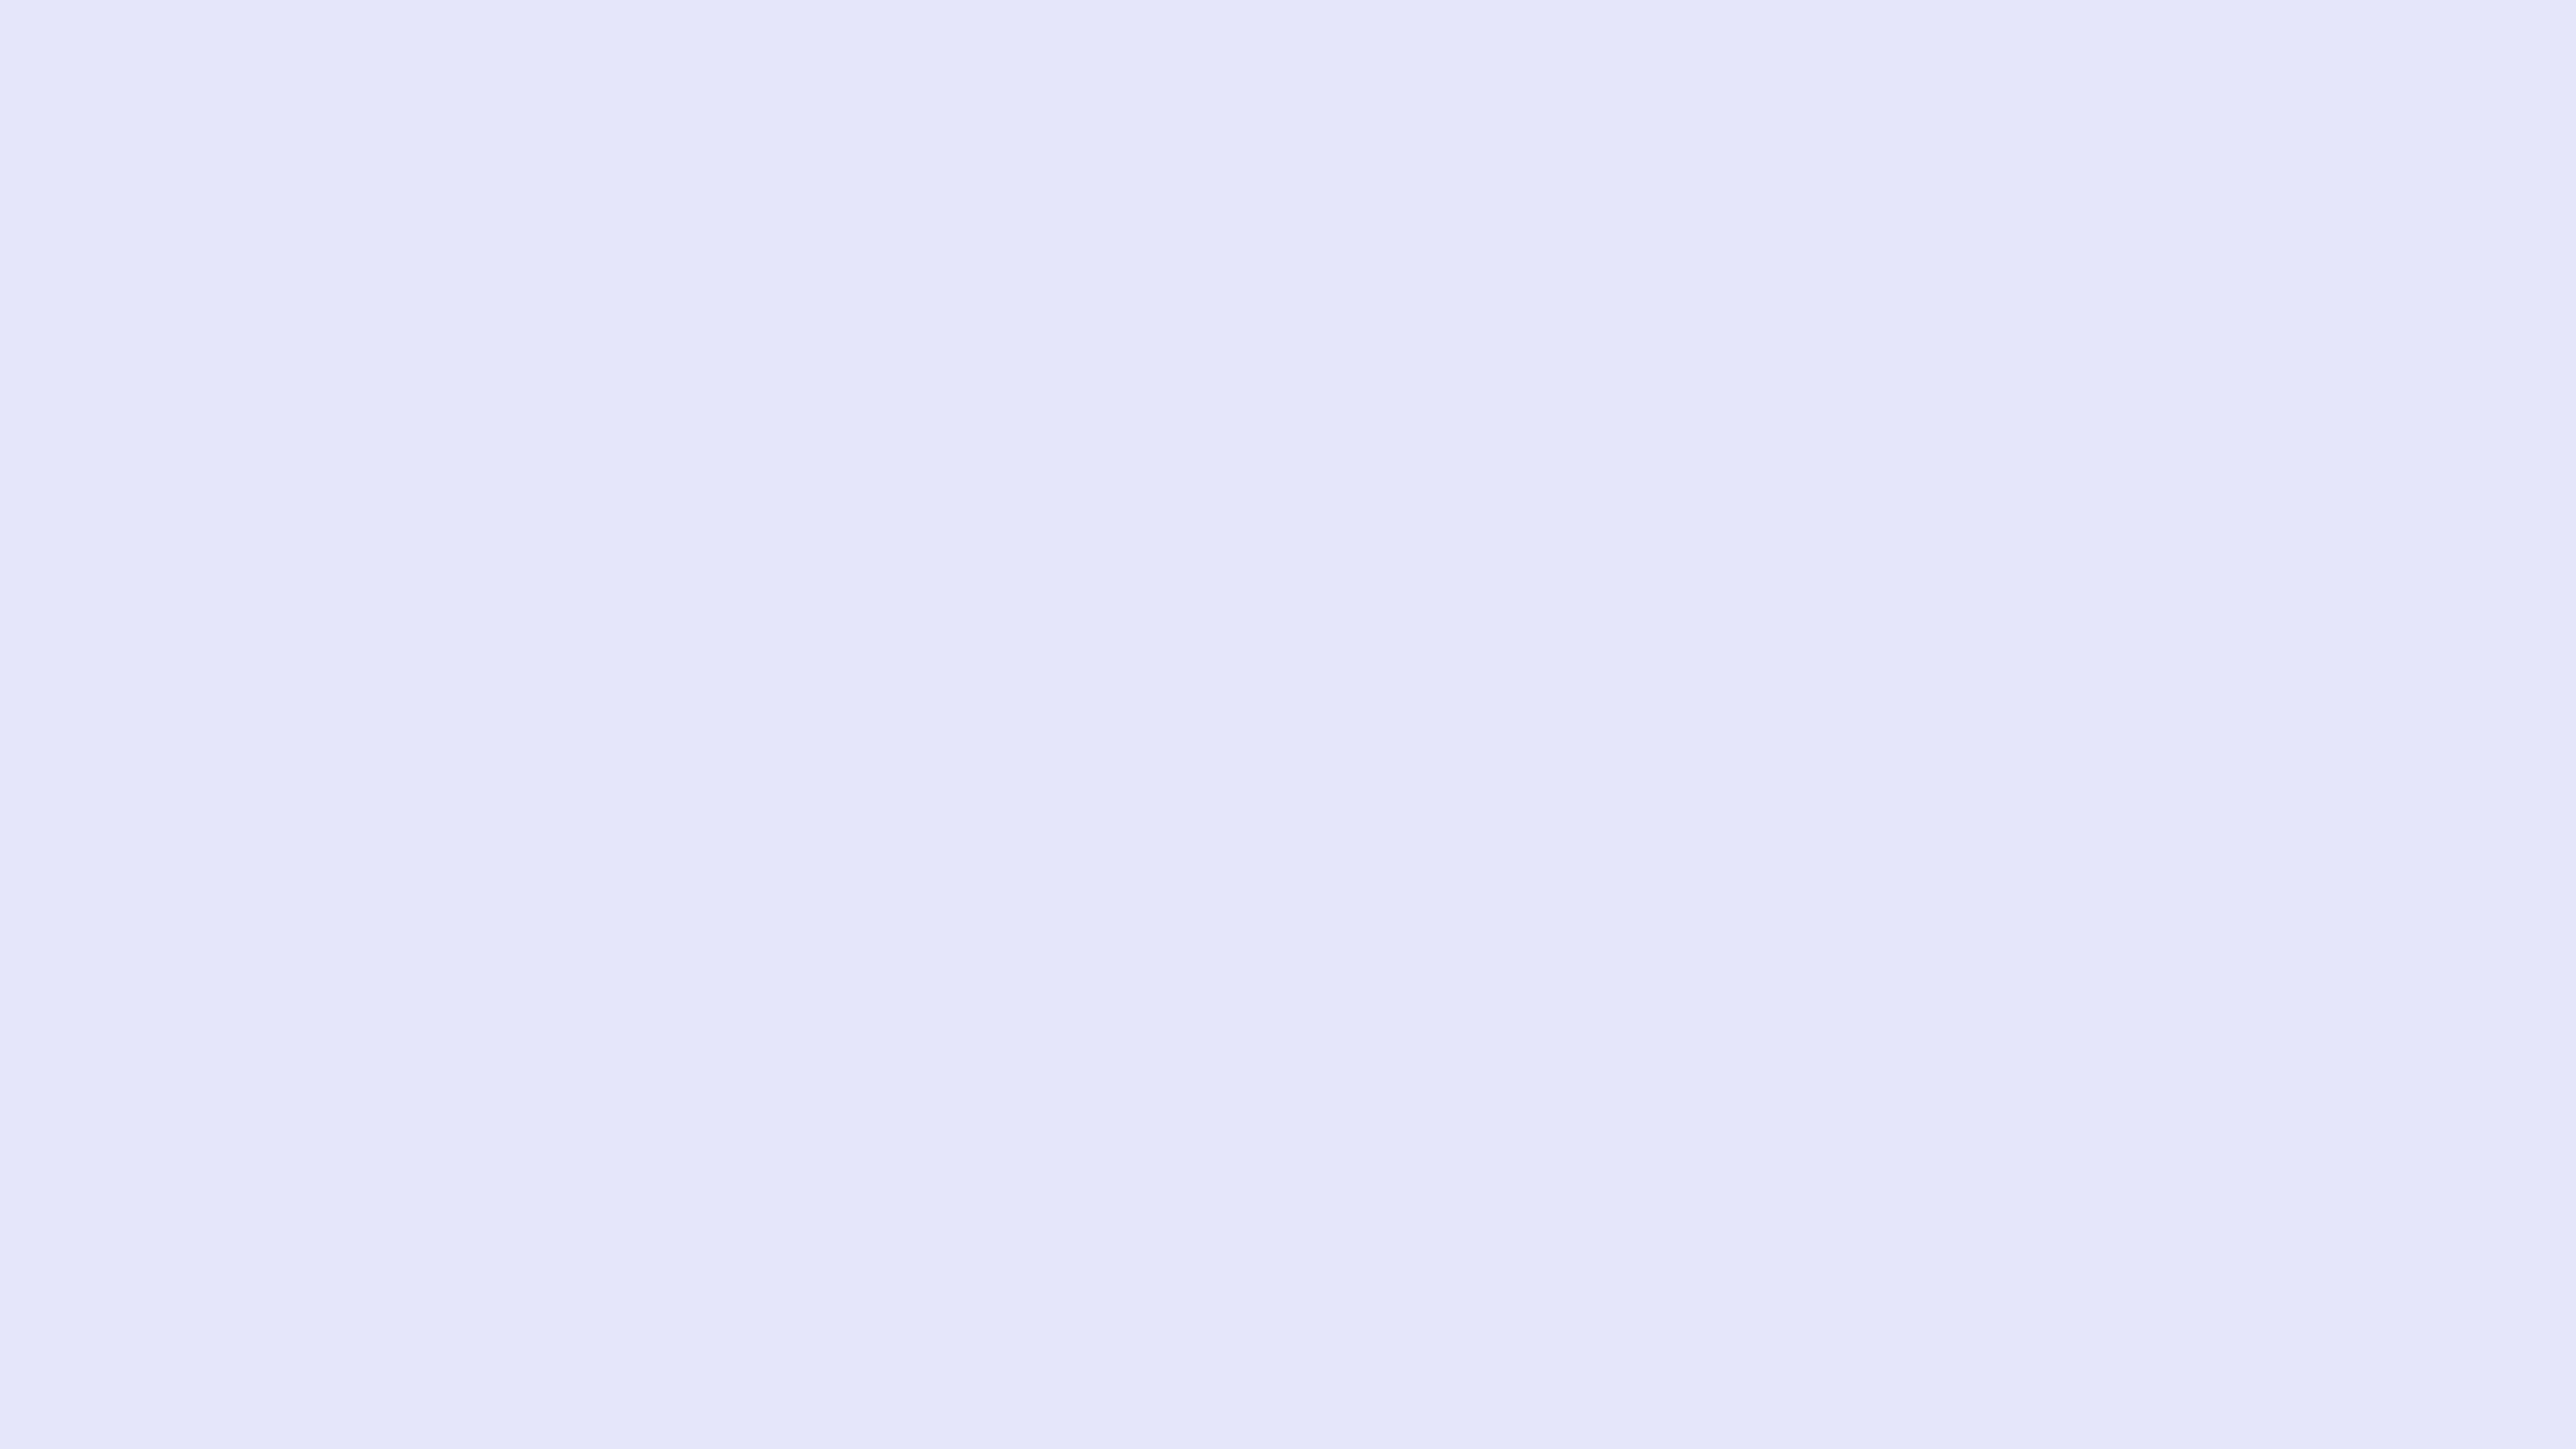 3840x2160 Lavender Web Solid Color Background